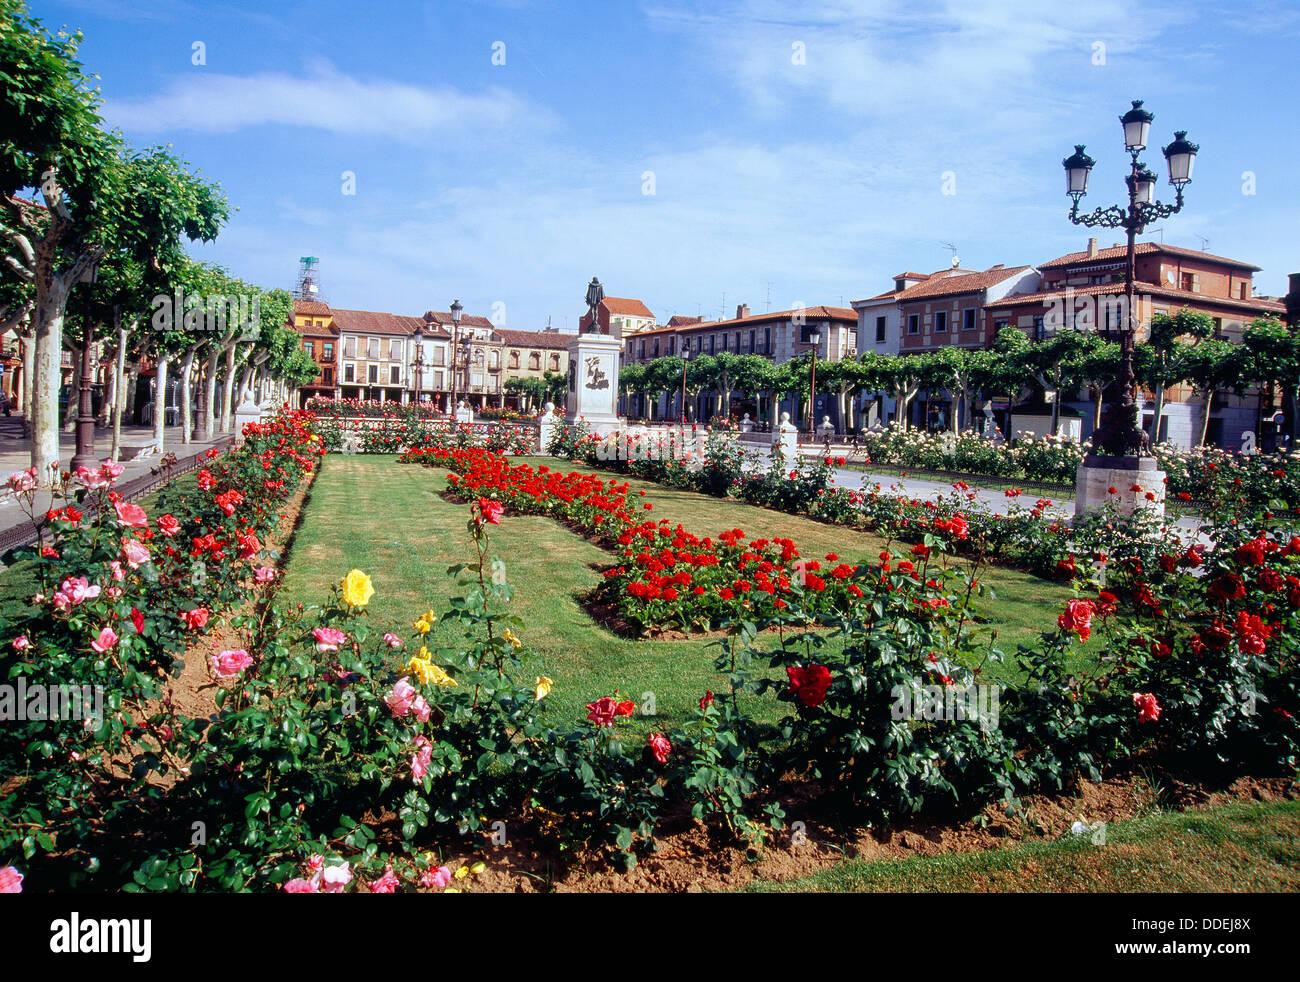 Cervantes Square. Alcala de Henares, Madrid province, Spain. - Stock Image